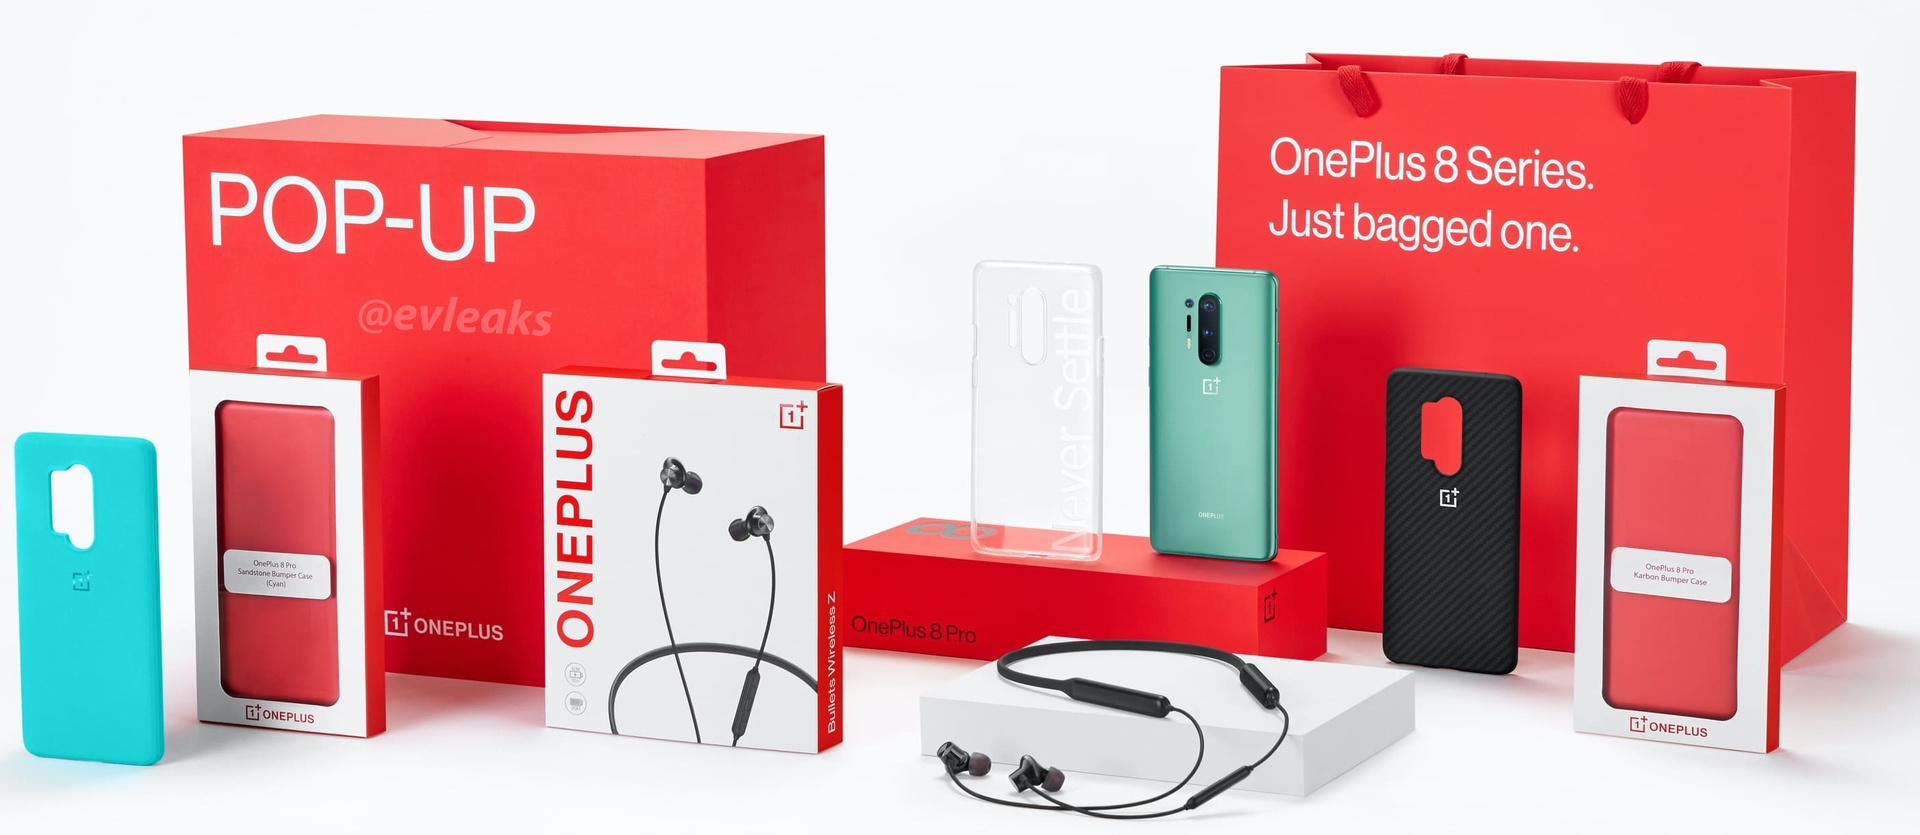 OnePlus 8 series pop up box